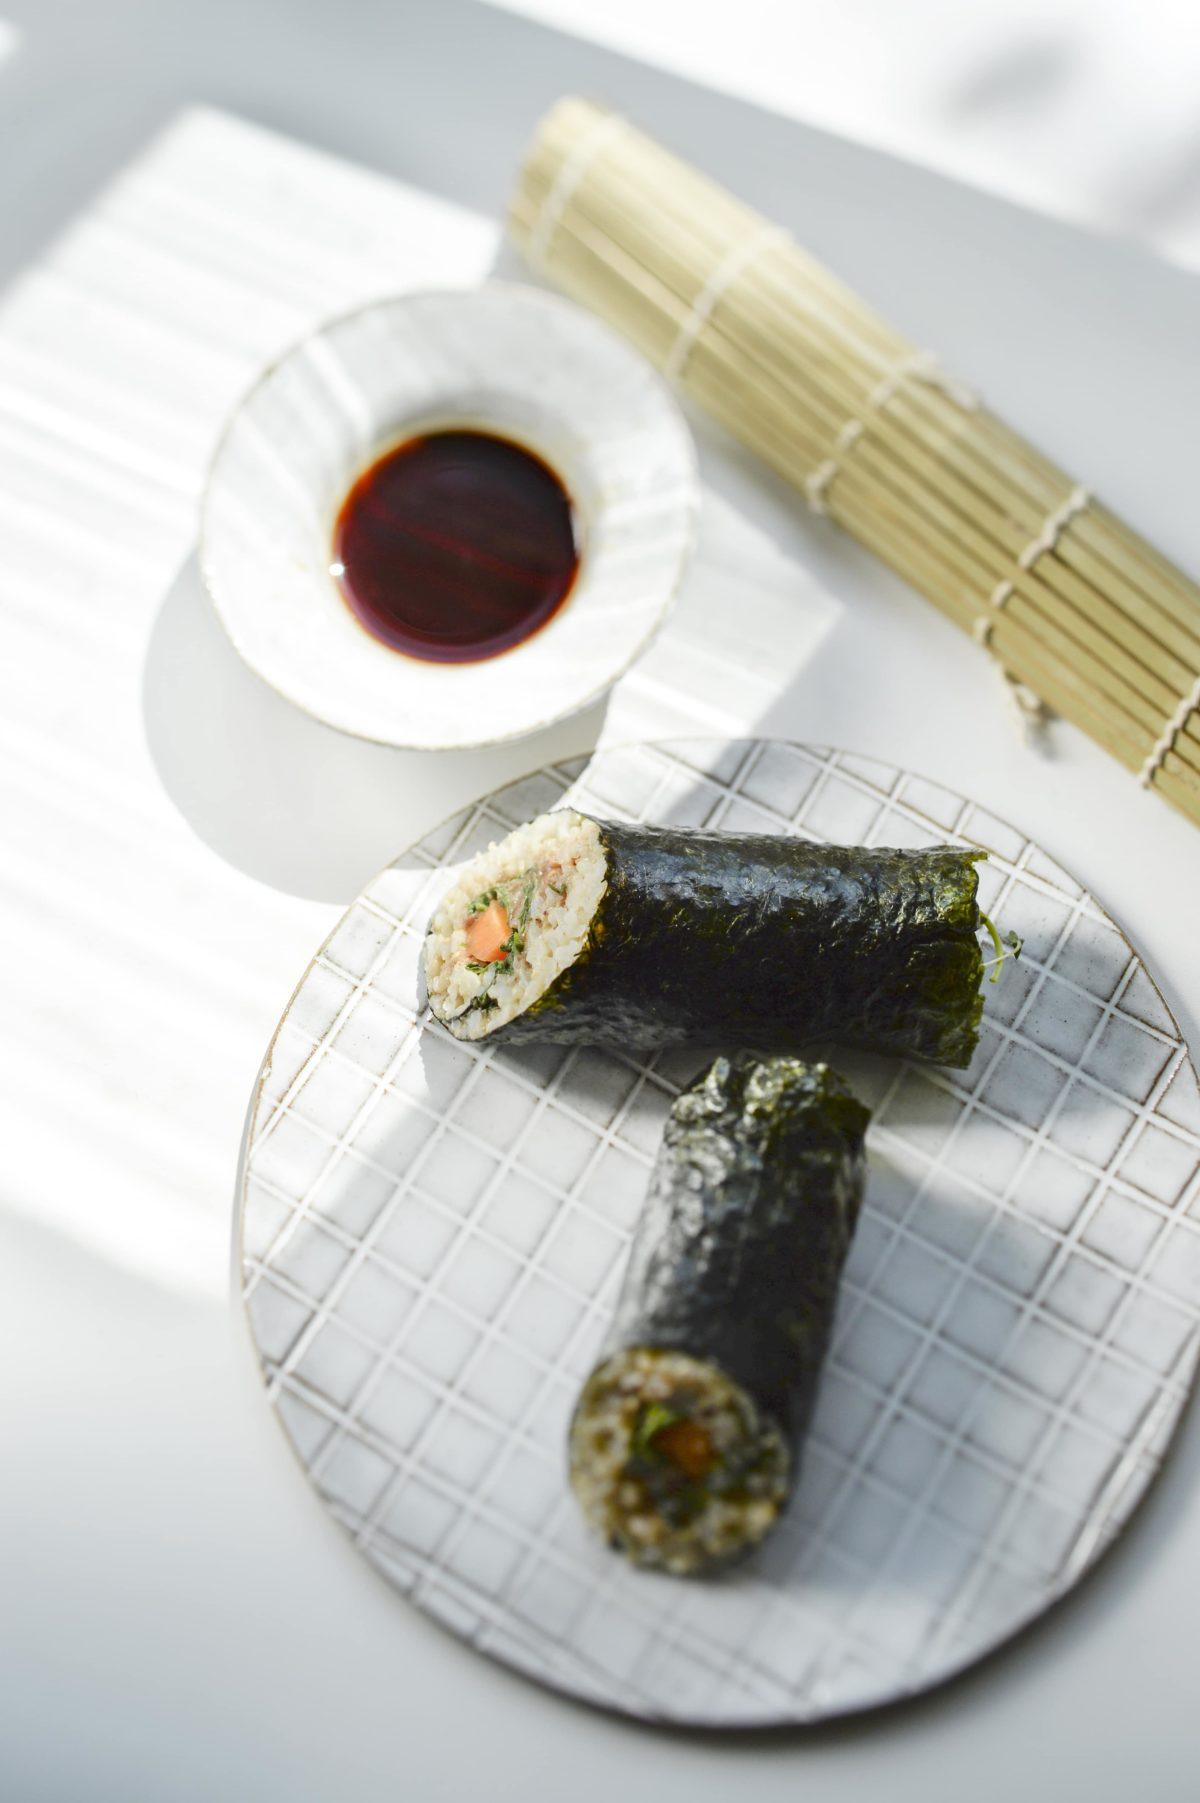 makrobiotik-madhavi-guemoes-in-fülle-leben-macrobiotics-sushi-vegan-book-buch